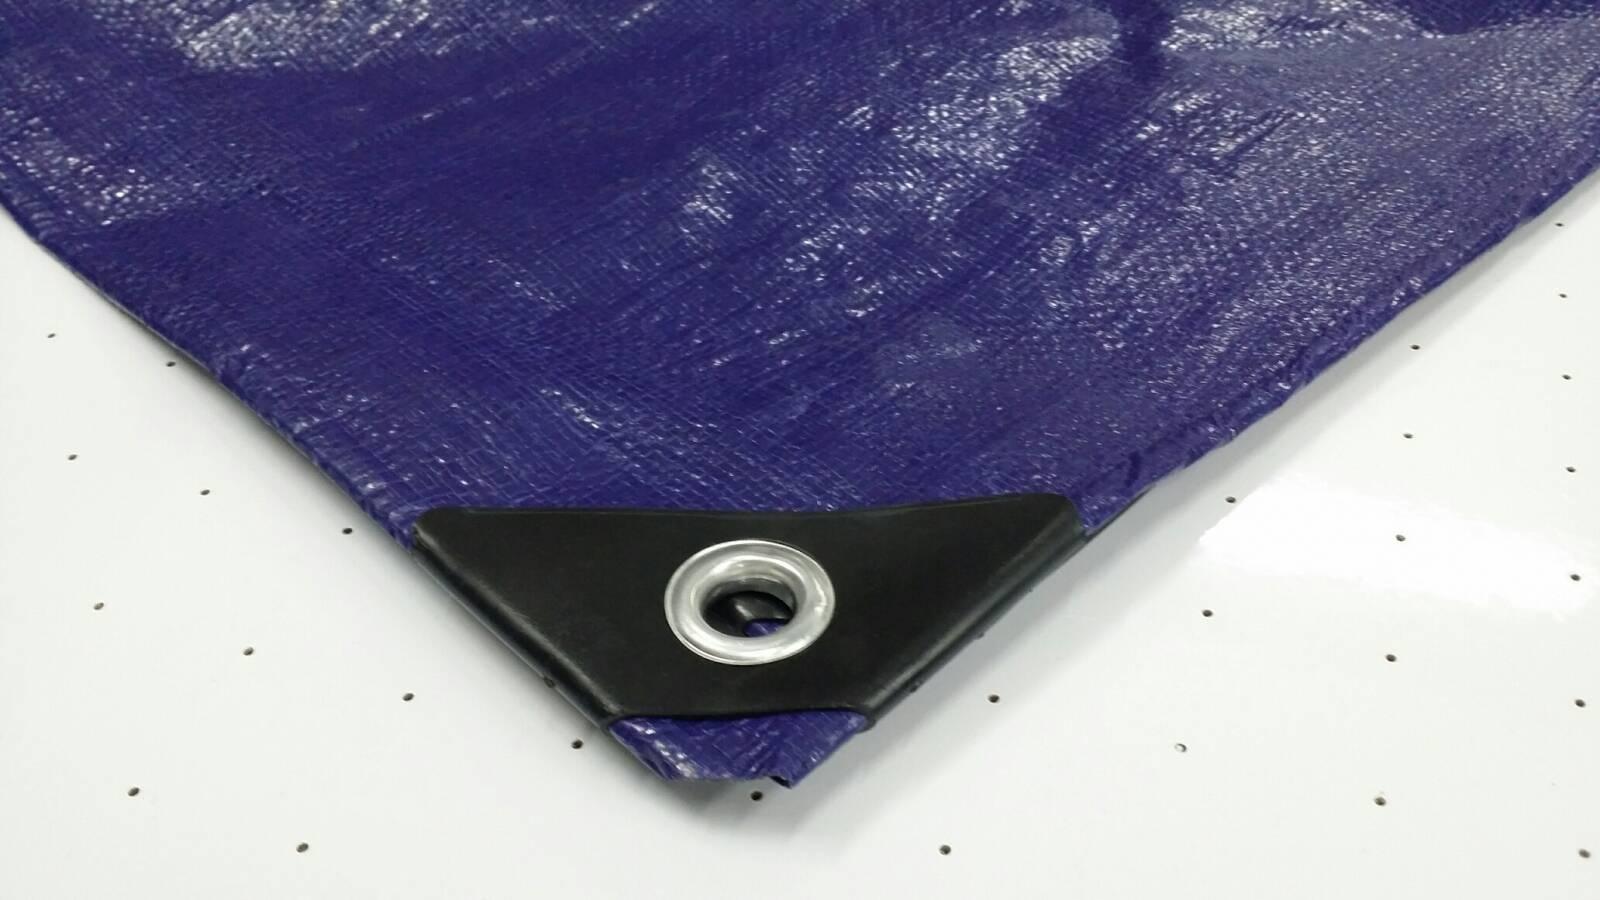 Lona extra reforzada 2x3 m - Heavy Duty Impermeable y multiuso